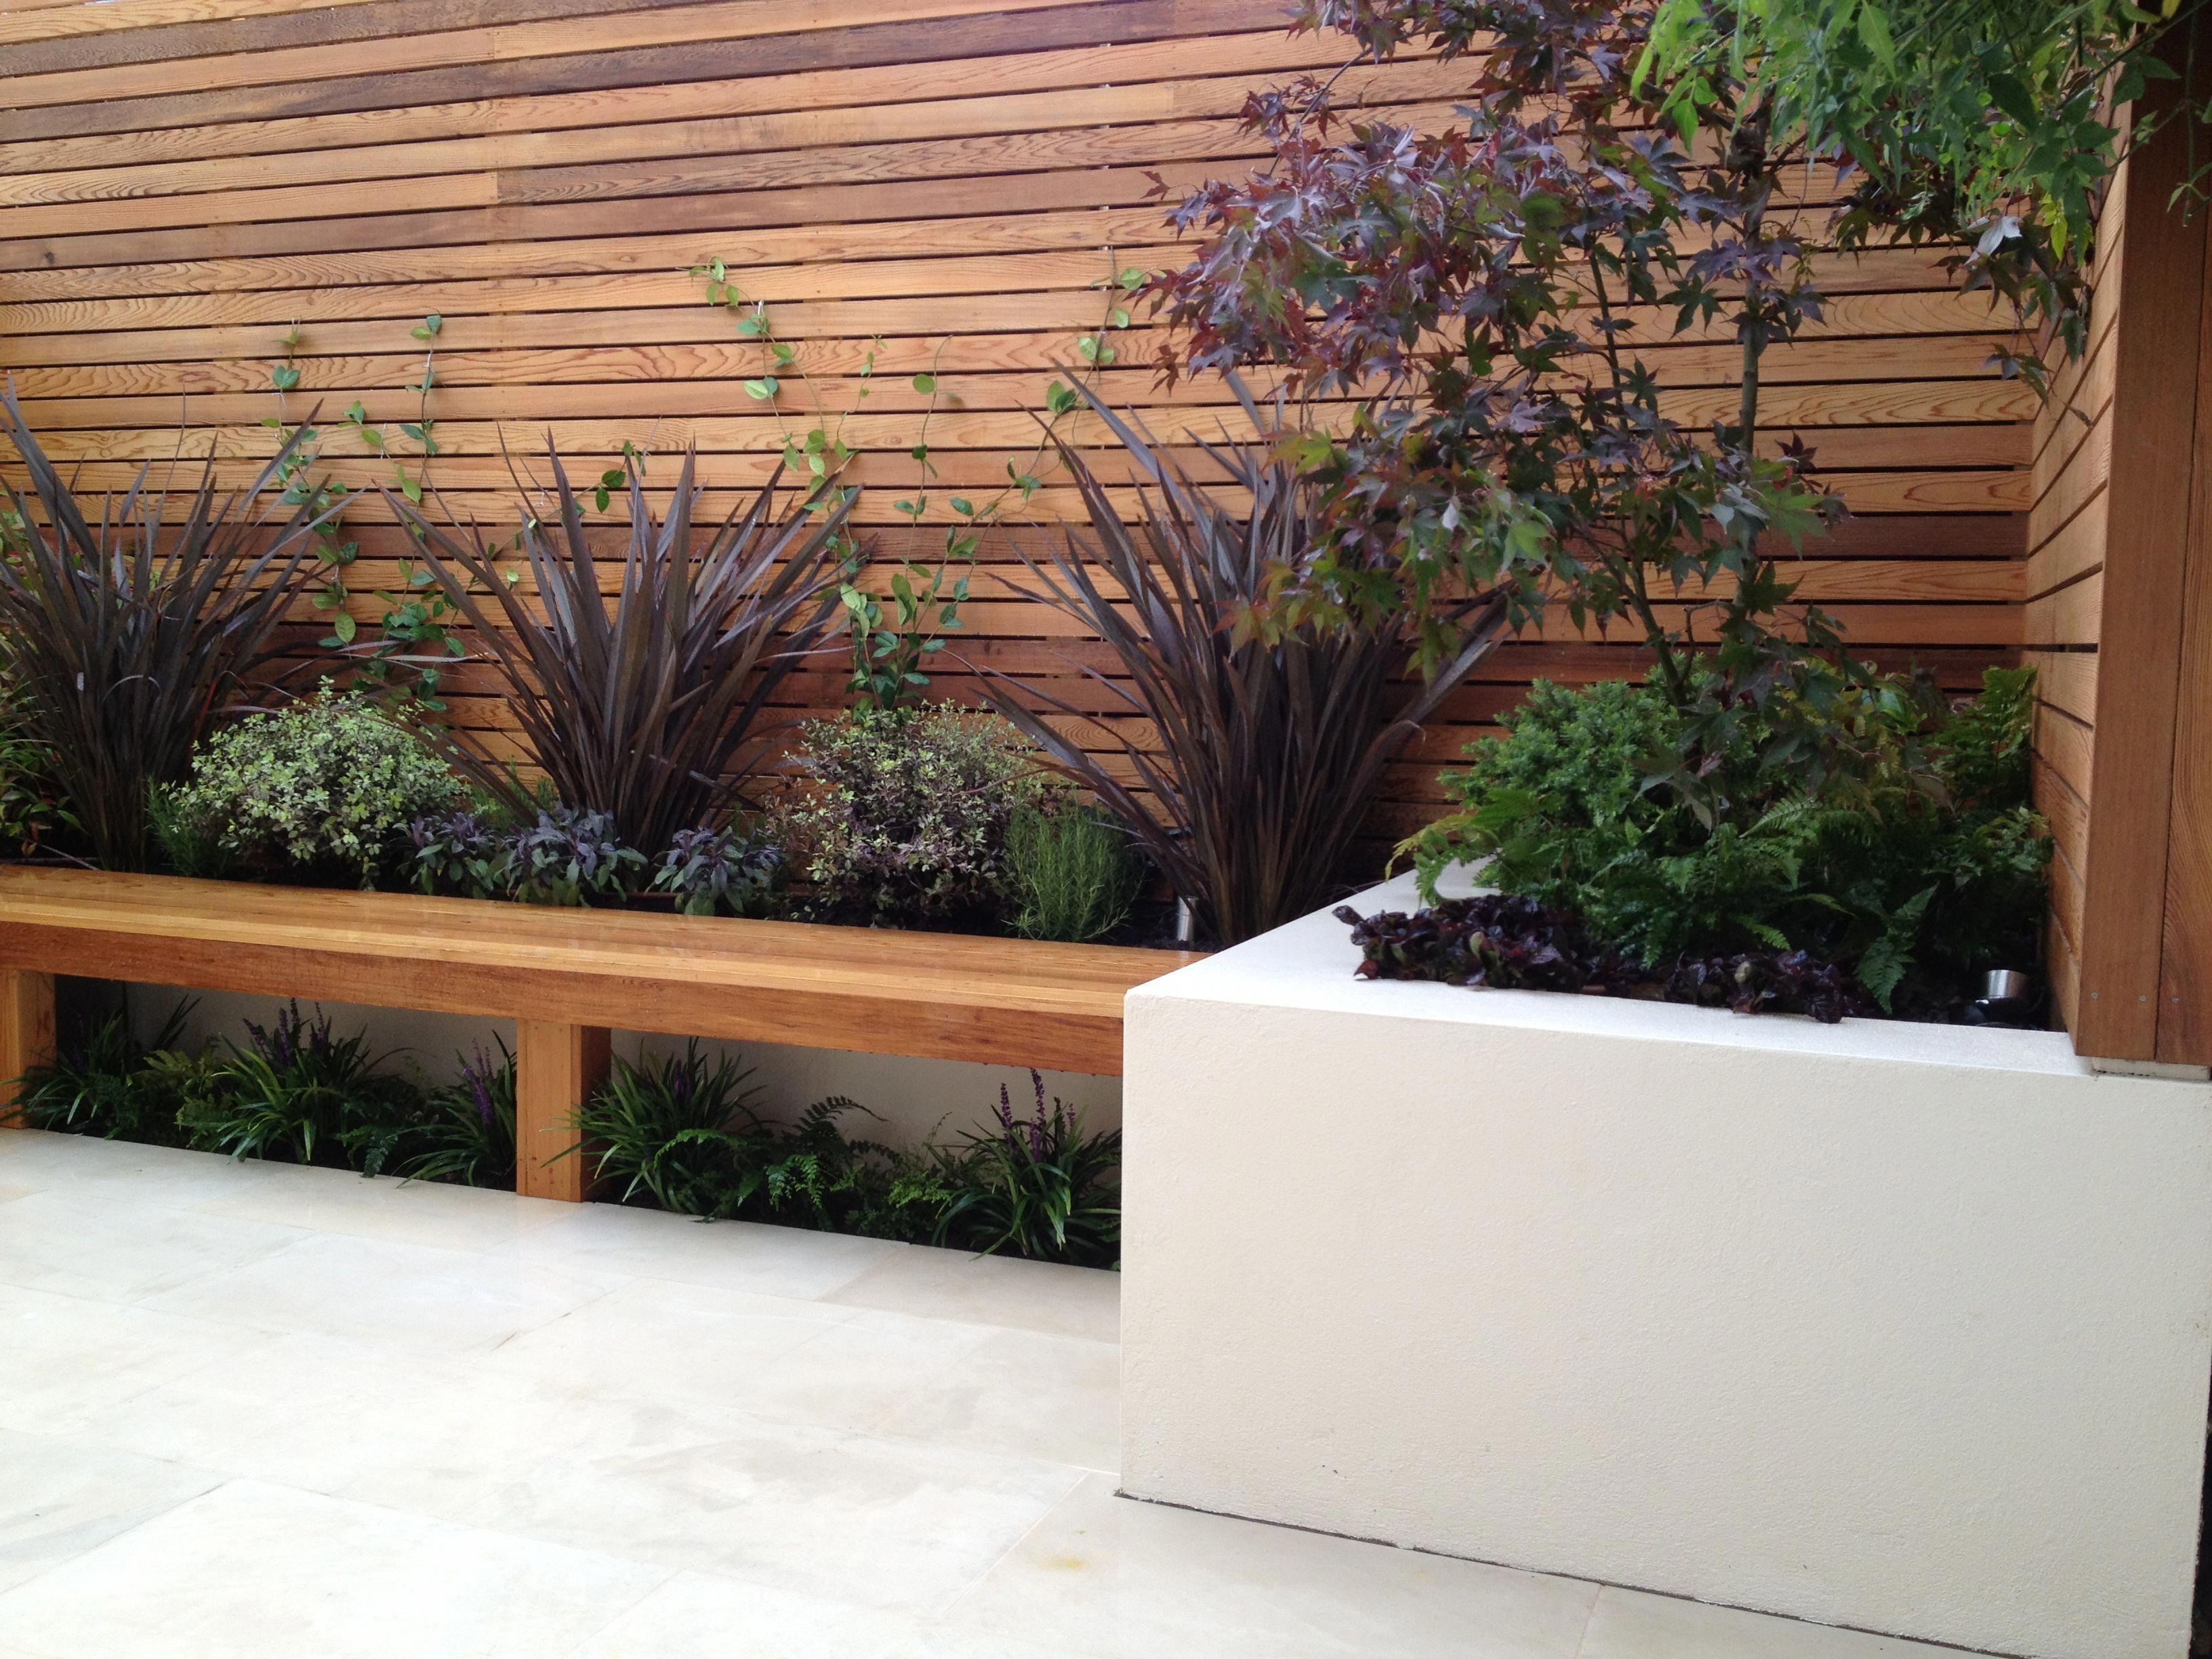 Small modern garden design ideas to get ideas how to redecorate